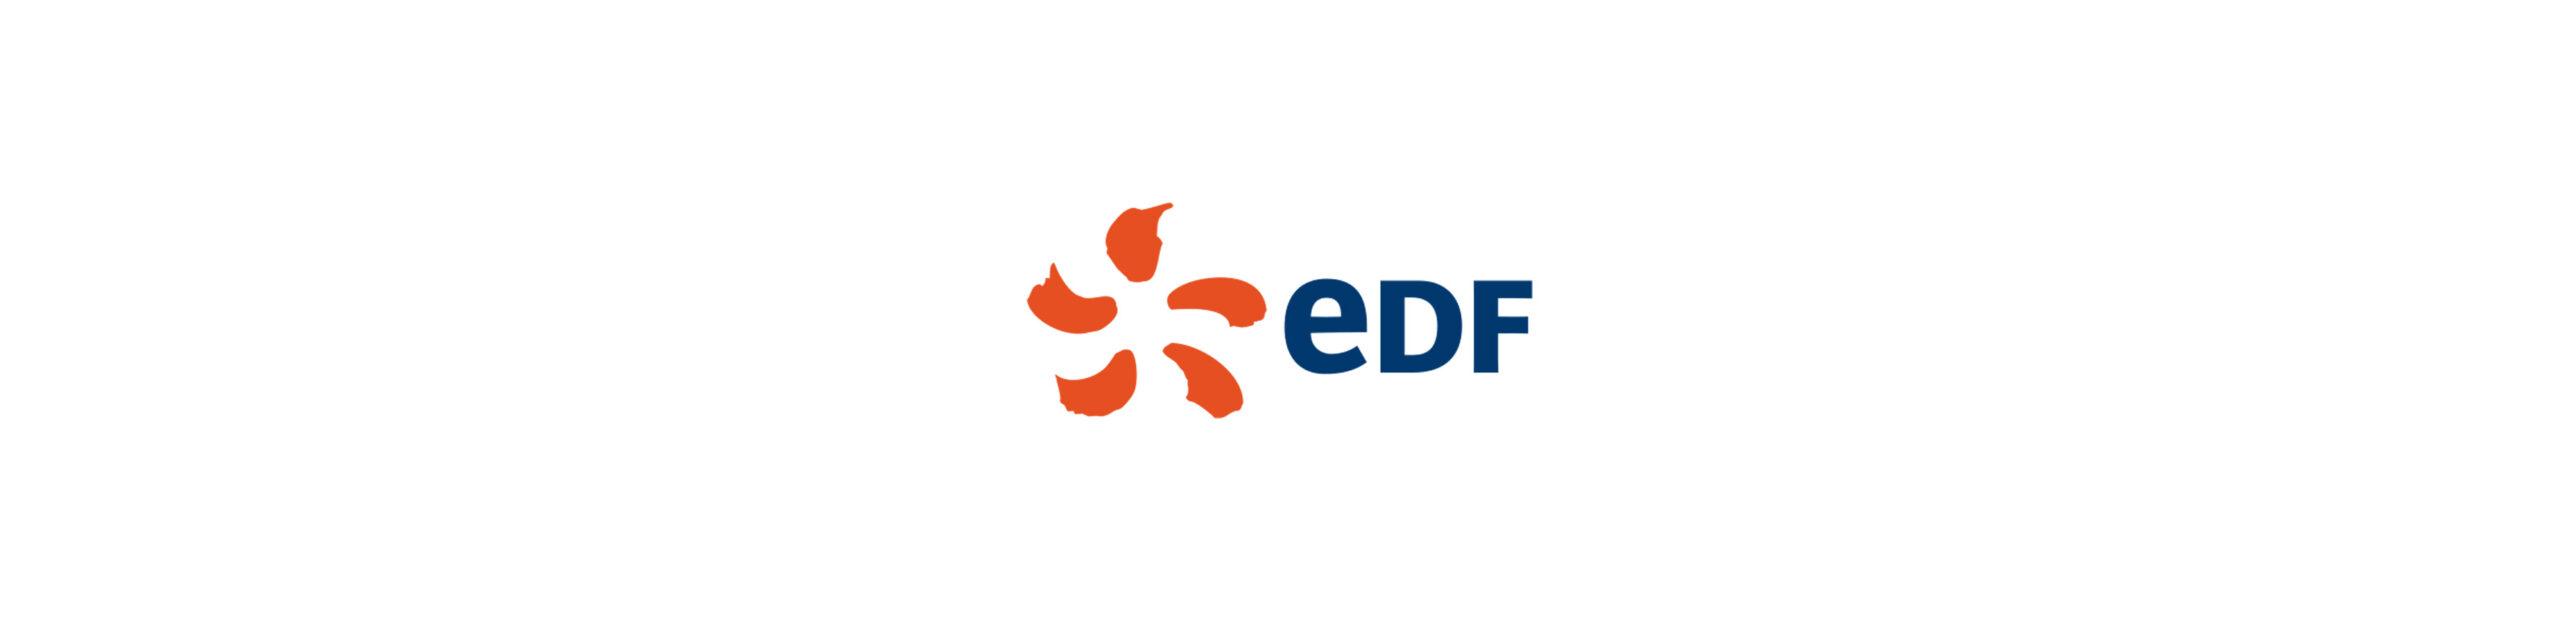 EDF COMMNICATION VIKIU